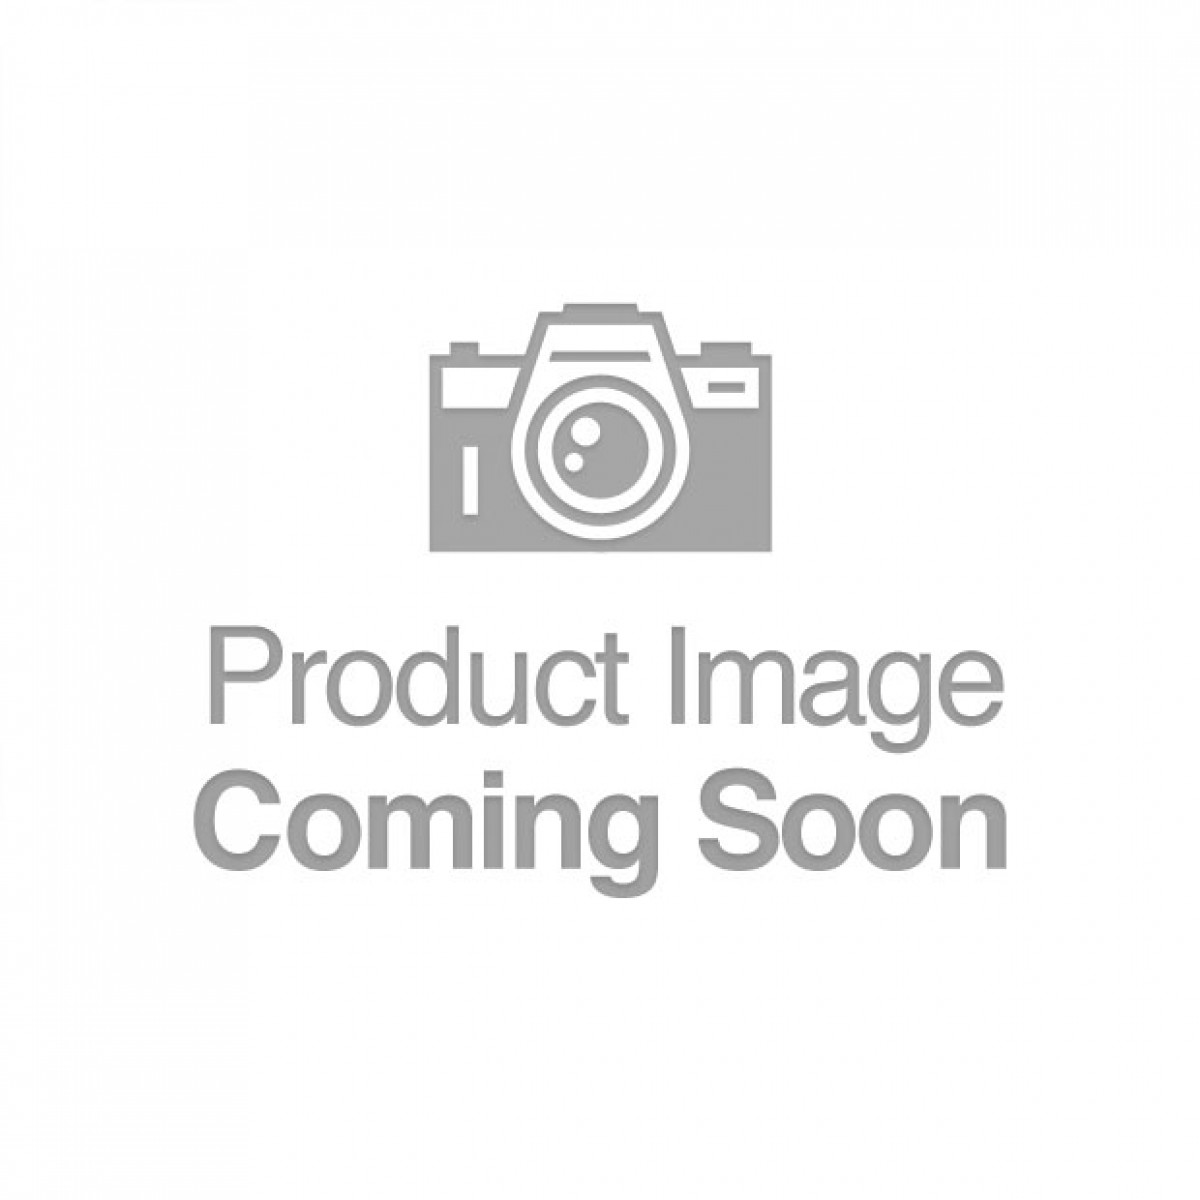 Blush Performance VX101 Male Enhancement Pump - Red